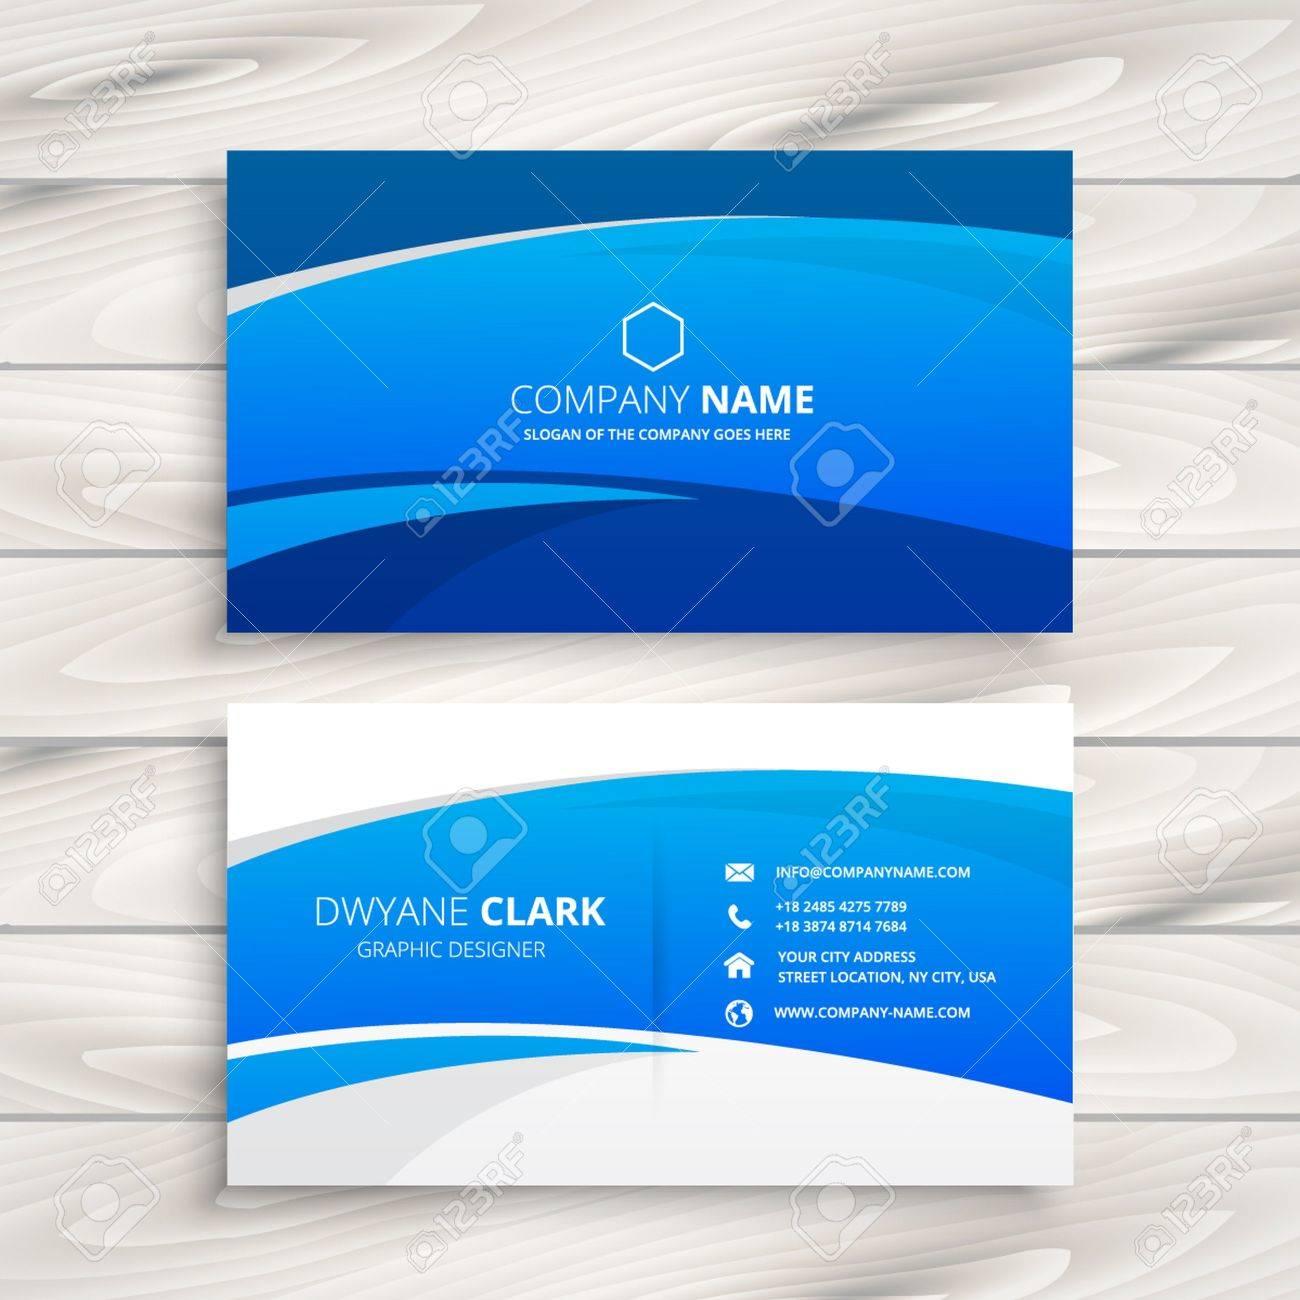 blue wave business card - 53481690